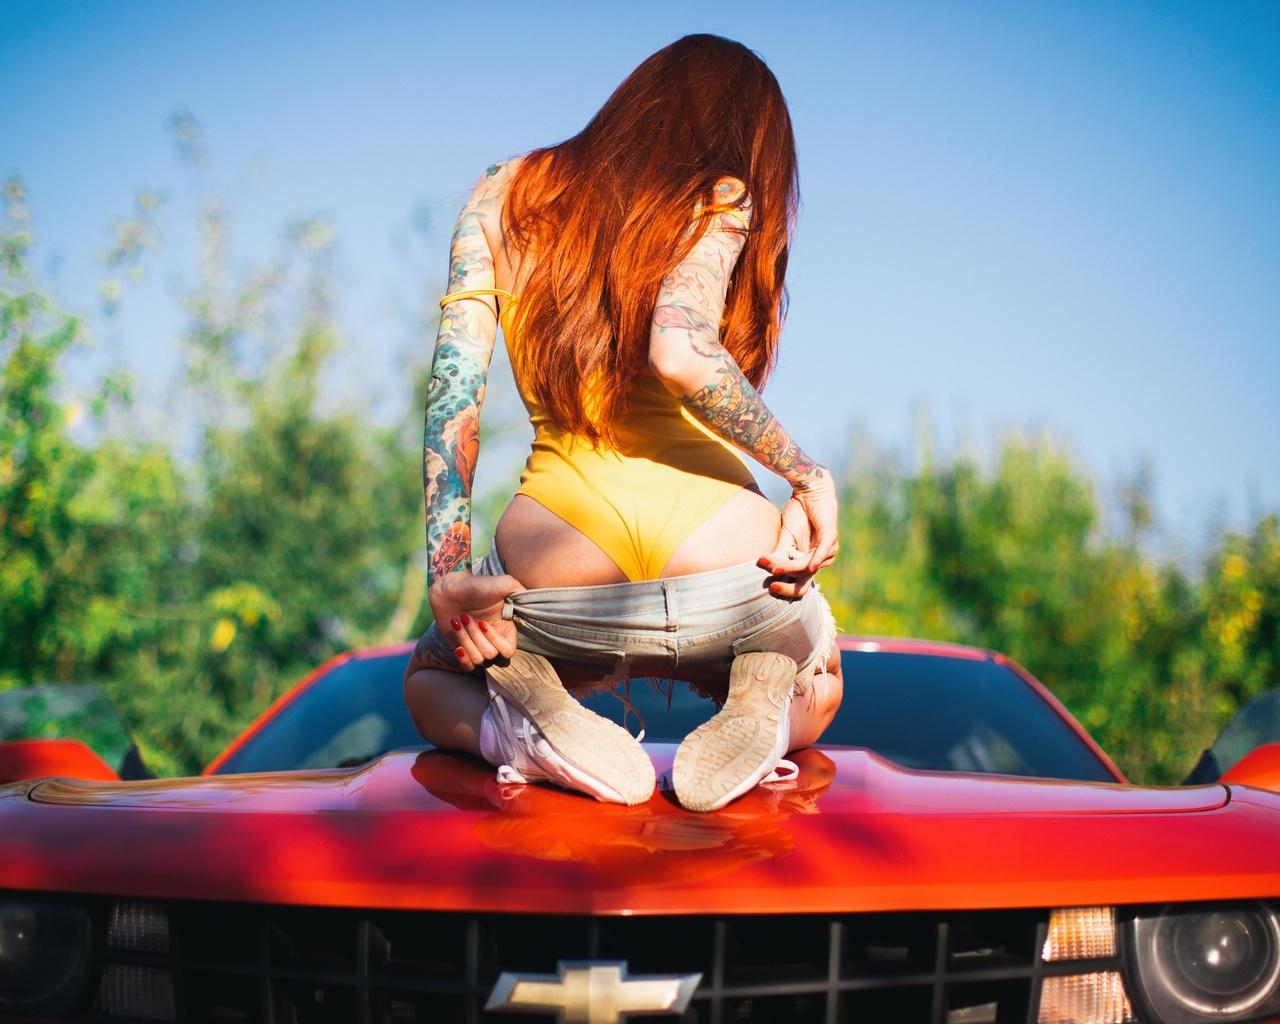 elune suicide, women, model, redhead, long hair, back, bodysuit, monokinis, ass, jean shorts, kneeling, sneakers, depth of field, chevrolet, chevrolet camaro, camaro, car, red cars, vehicle, women with cars, inked girls, tattoo, outdoors, women outdoors,